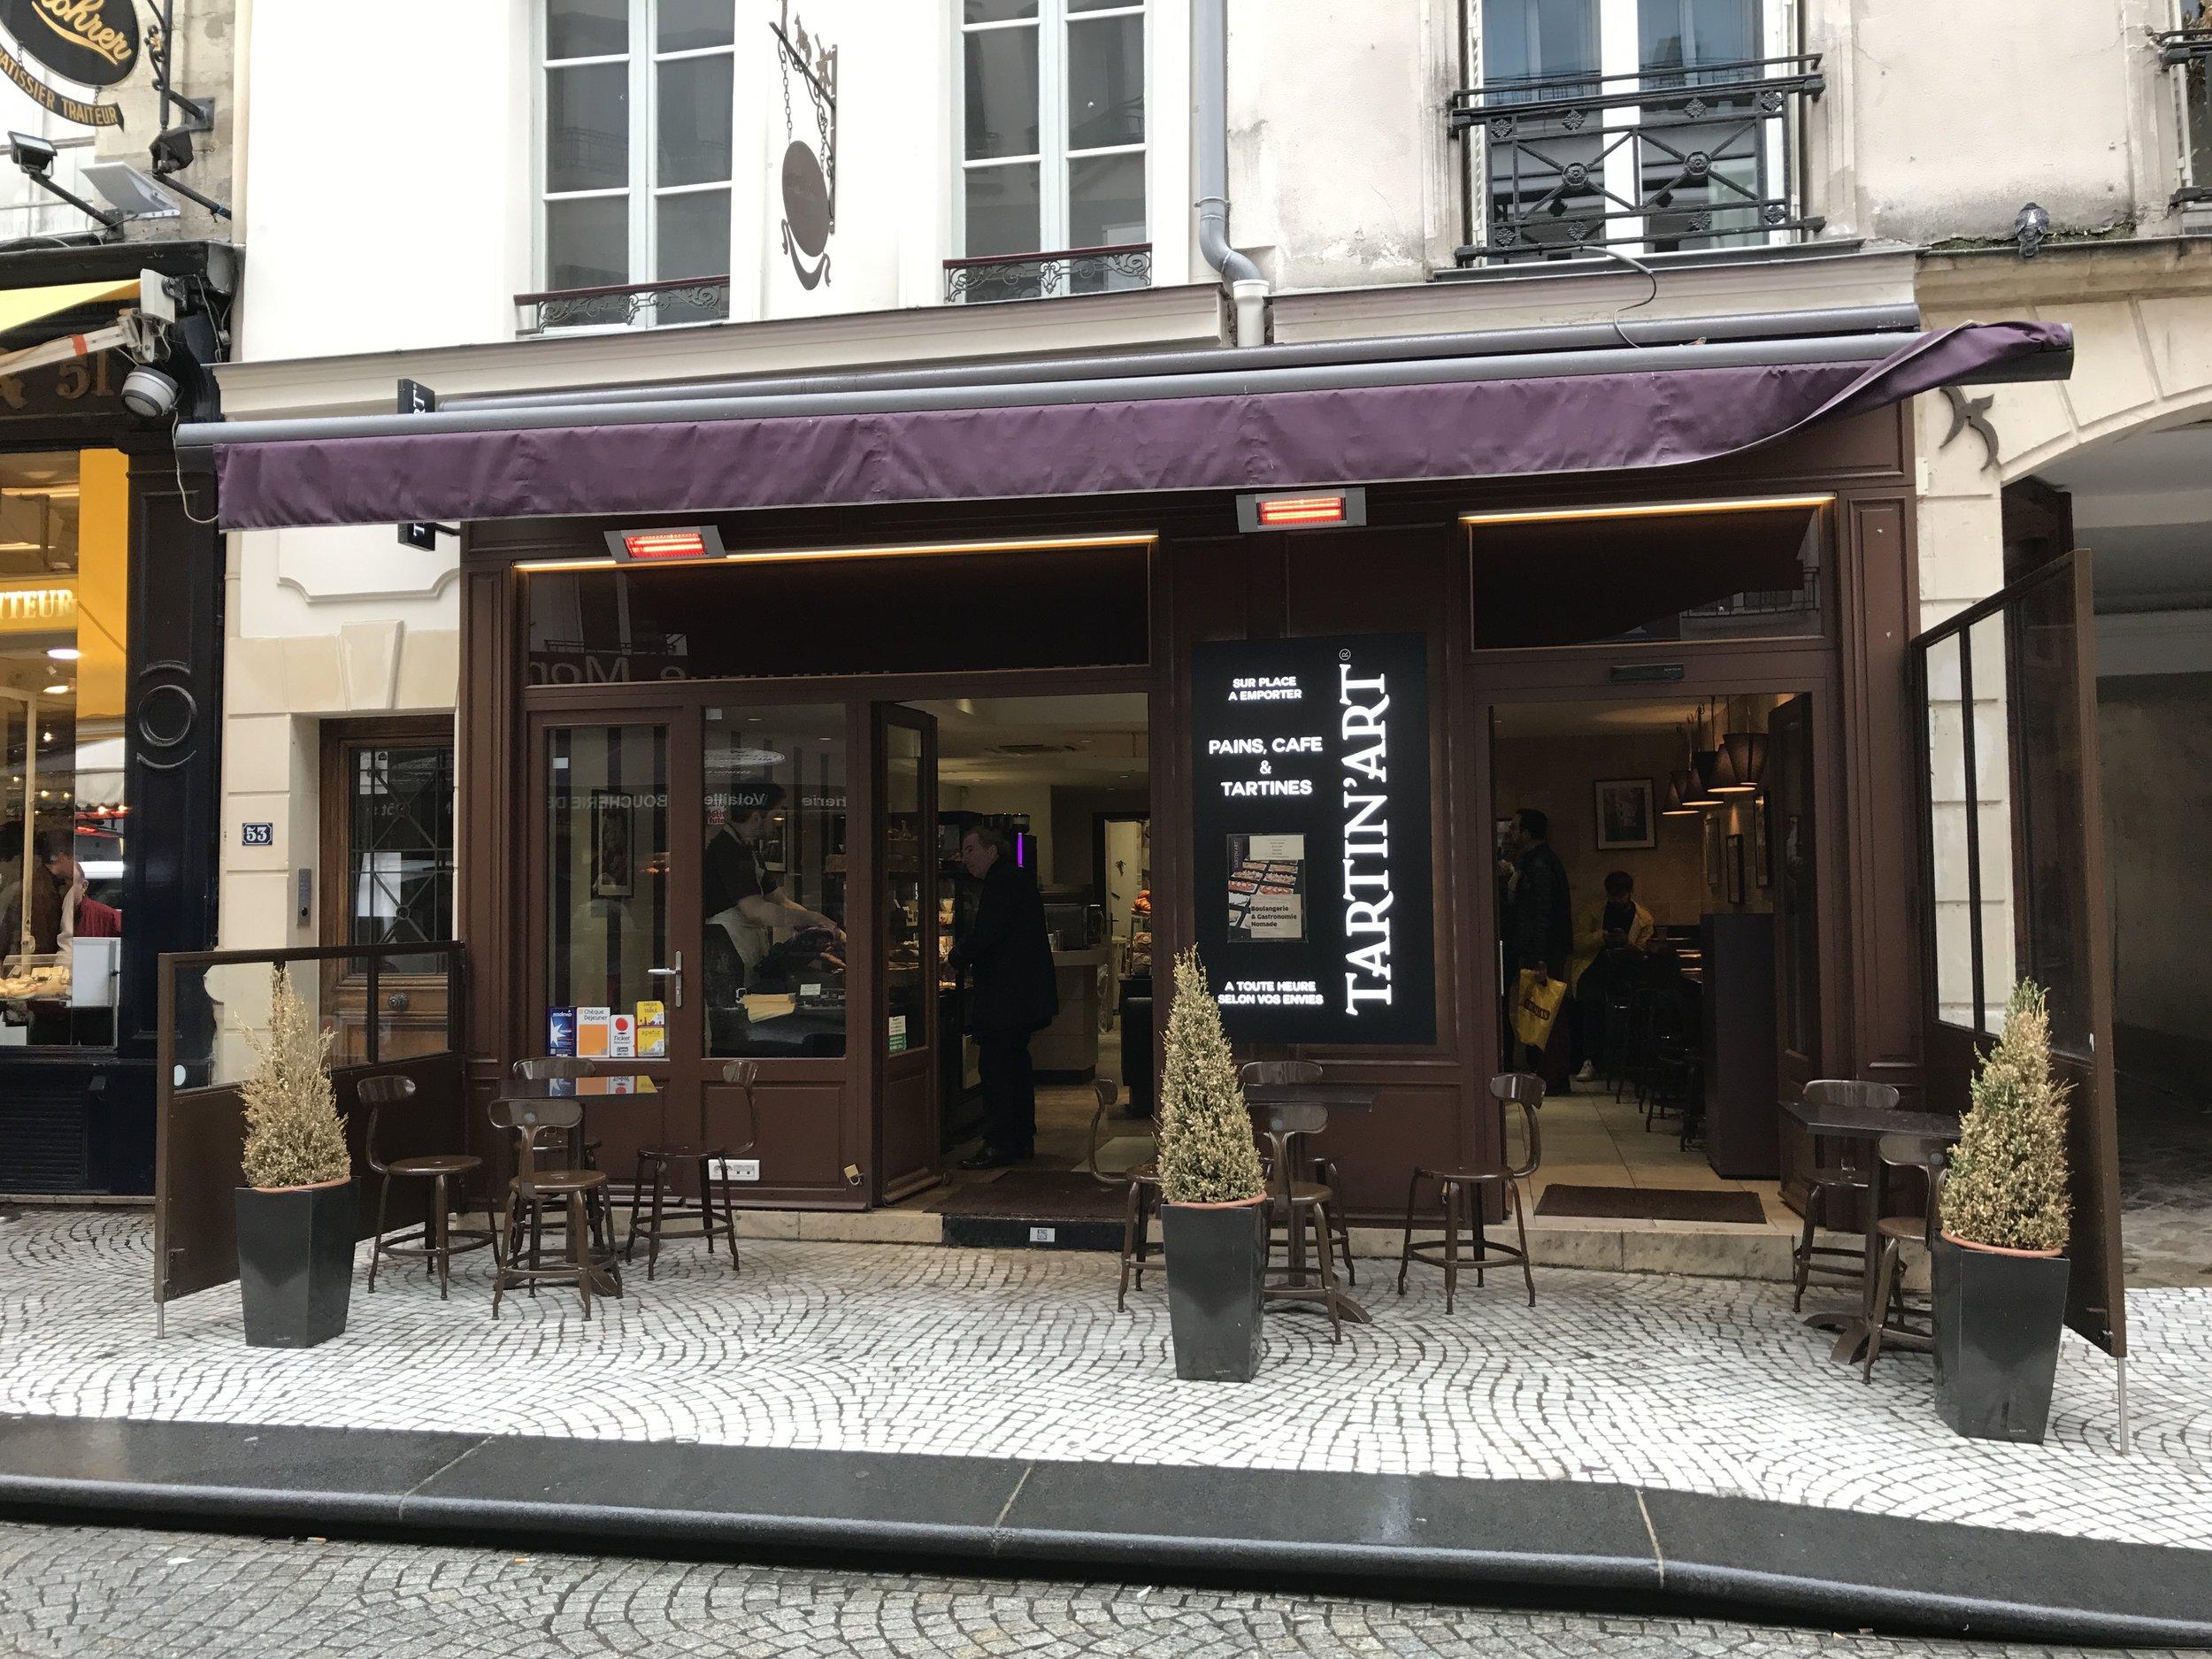 This is where we get our baguette de tradition française